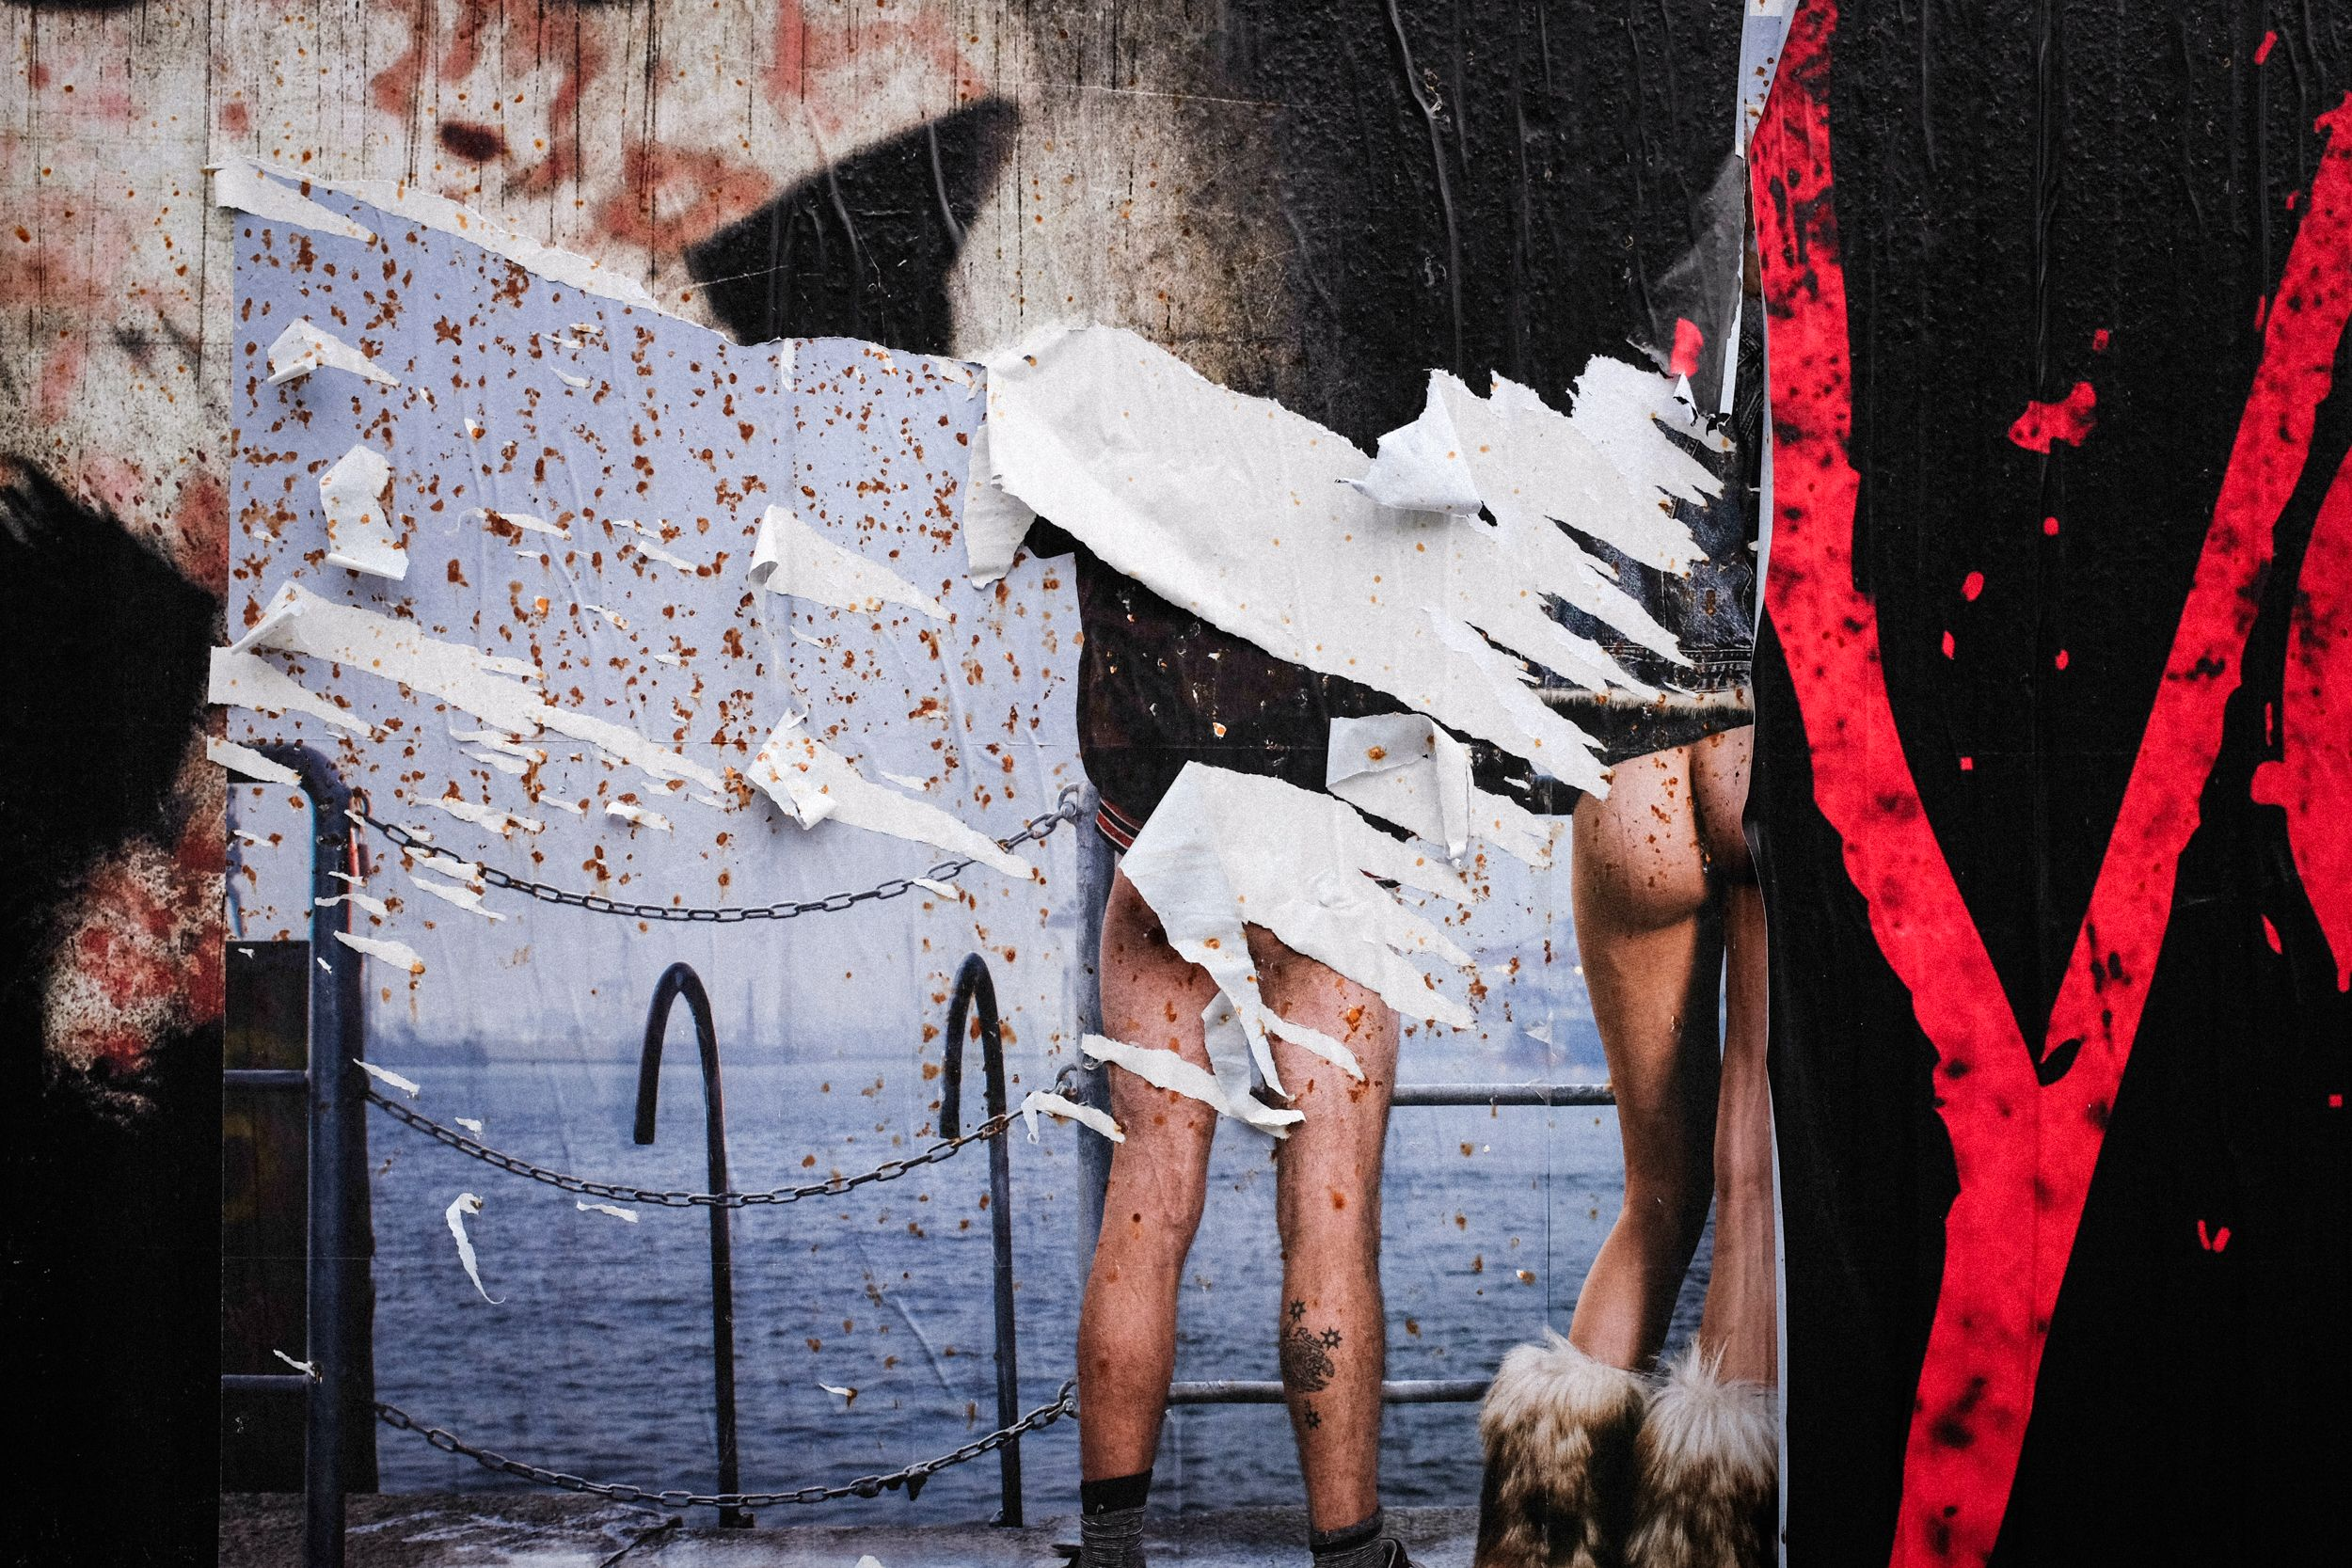 Plakat in Berlin Kreuzberg